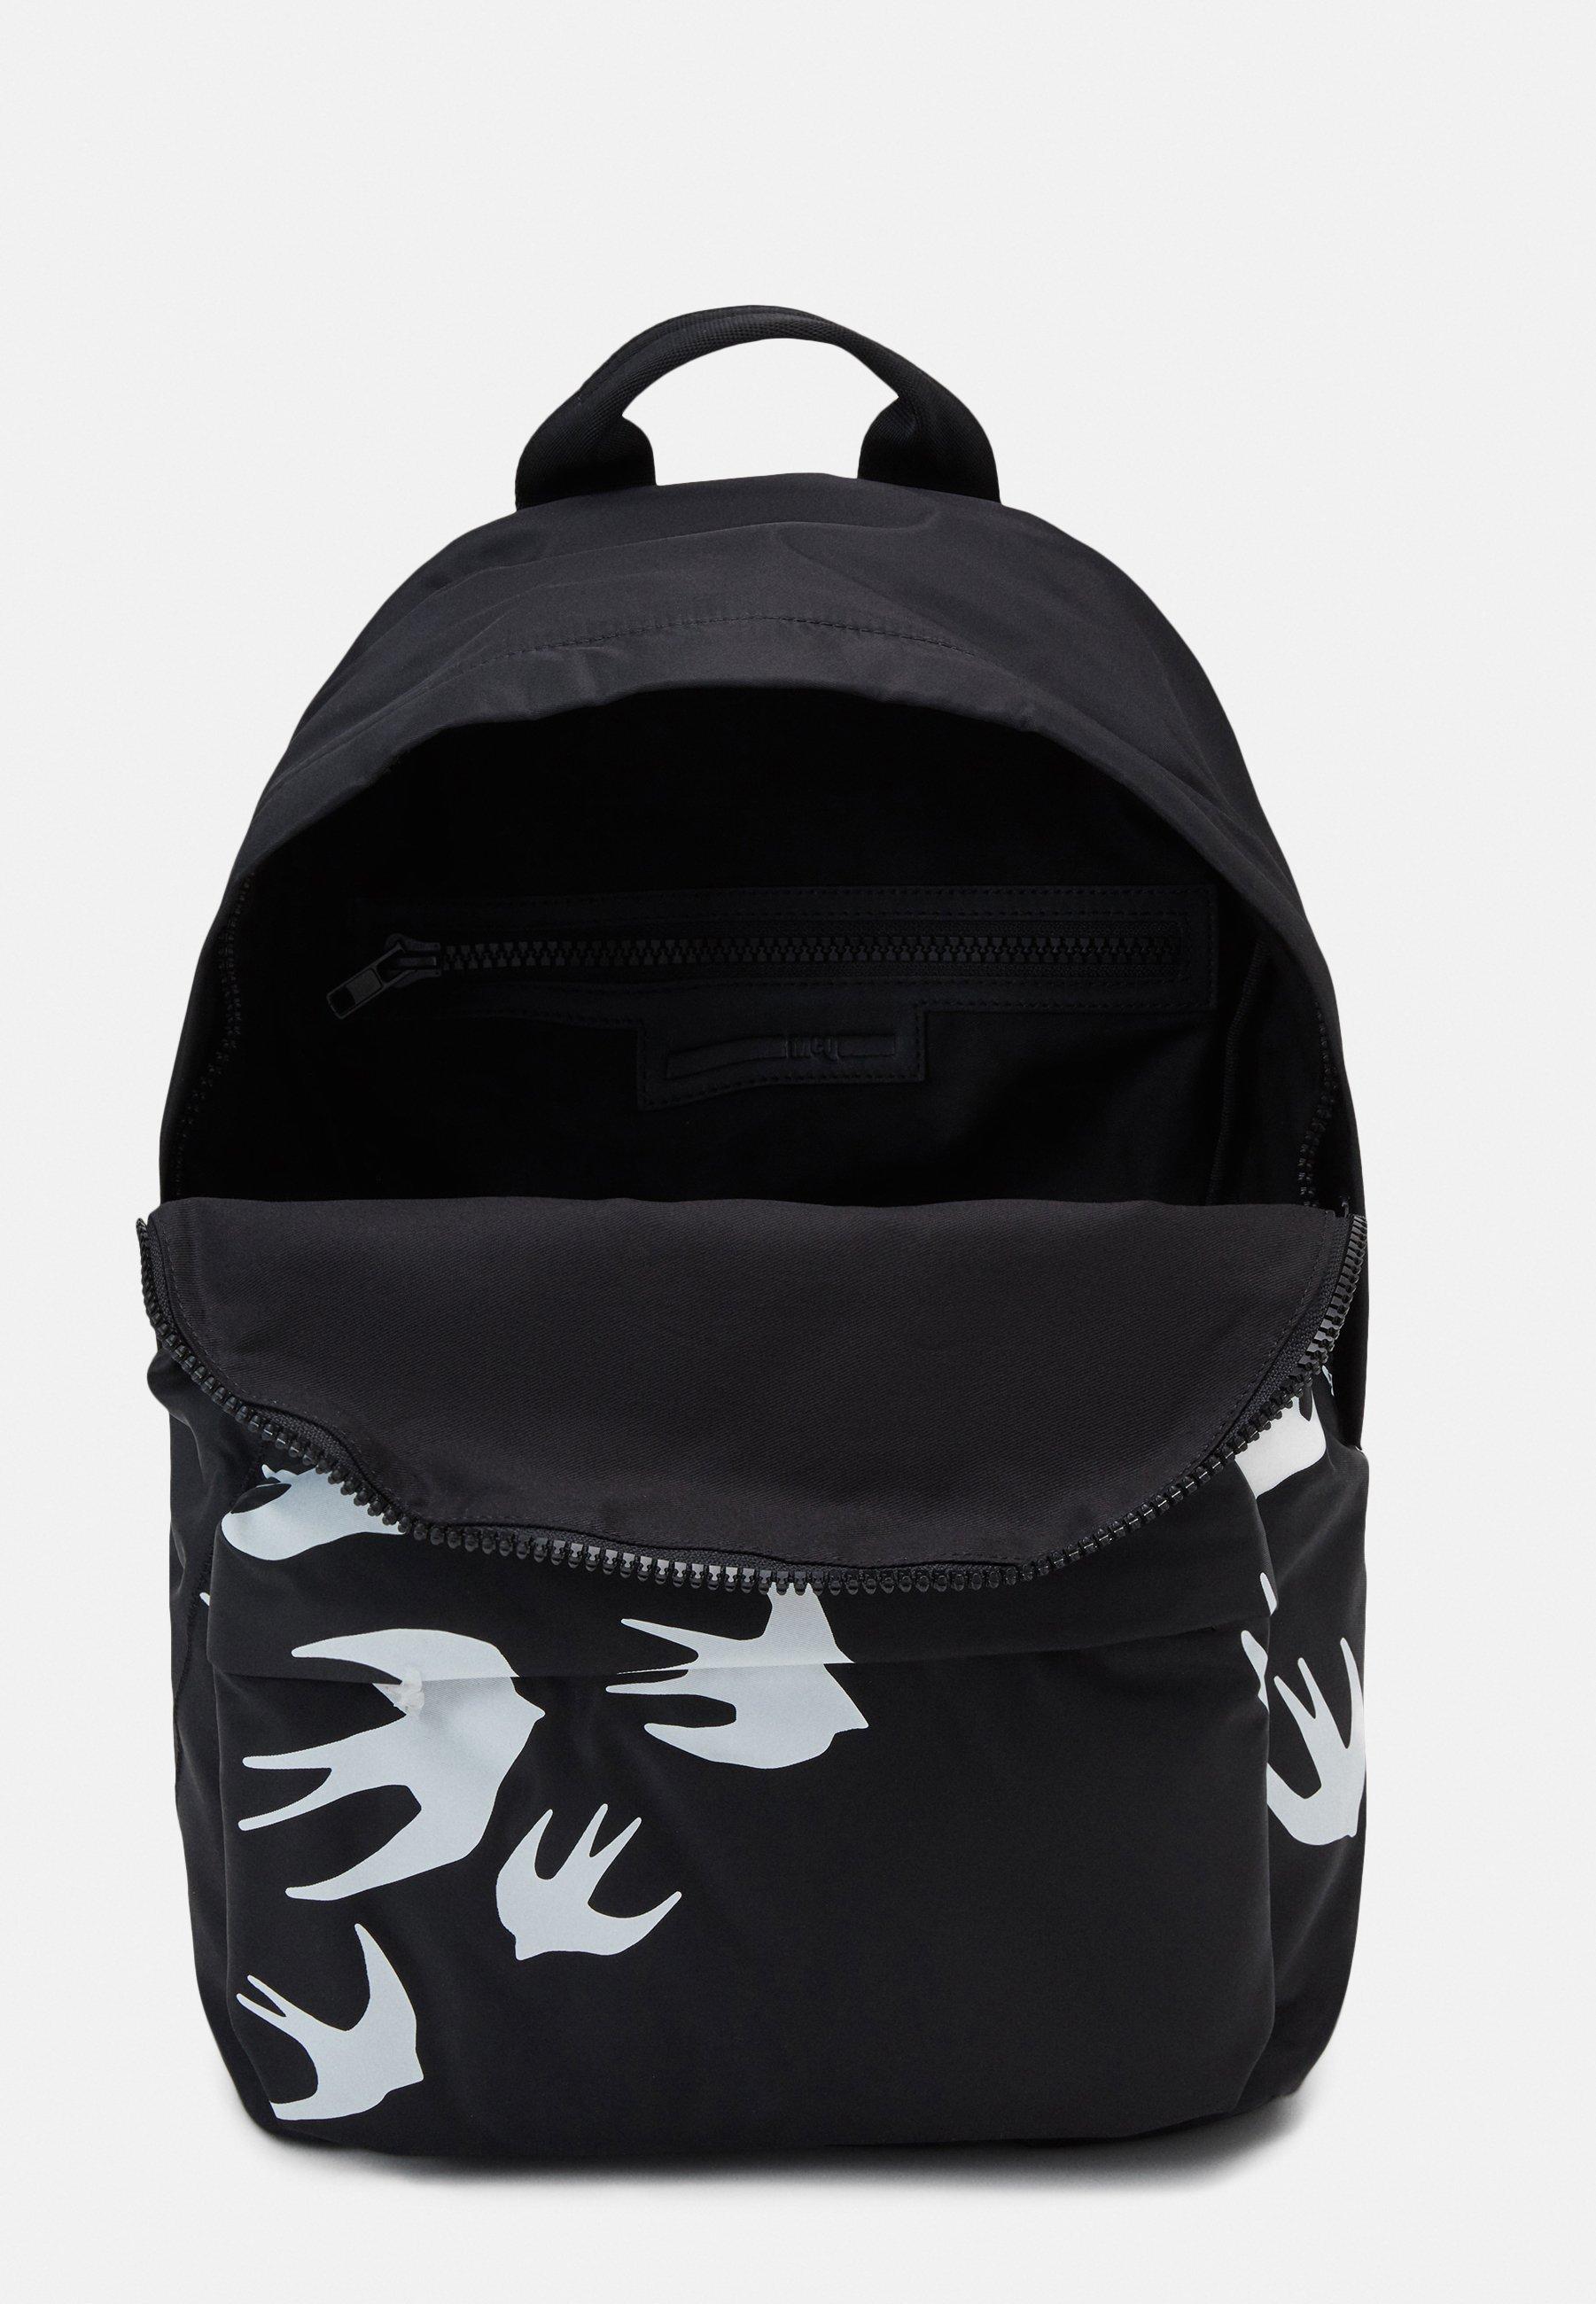 McQ Alexander McQueen CLASSIC BACKPACK SWALLOW - Ryggsekk - black/svart 1fCtCAyoZT2AkSh